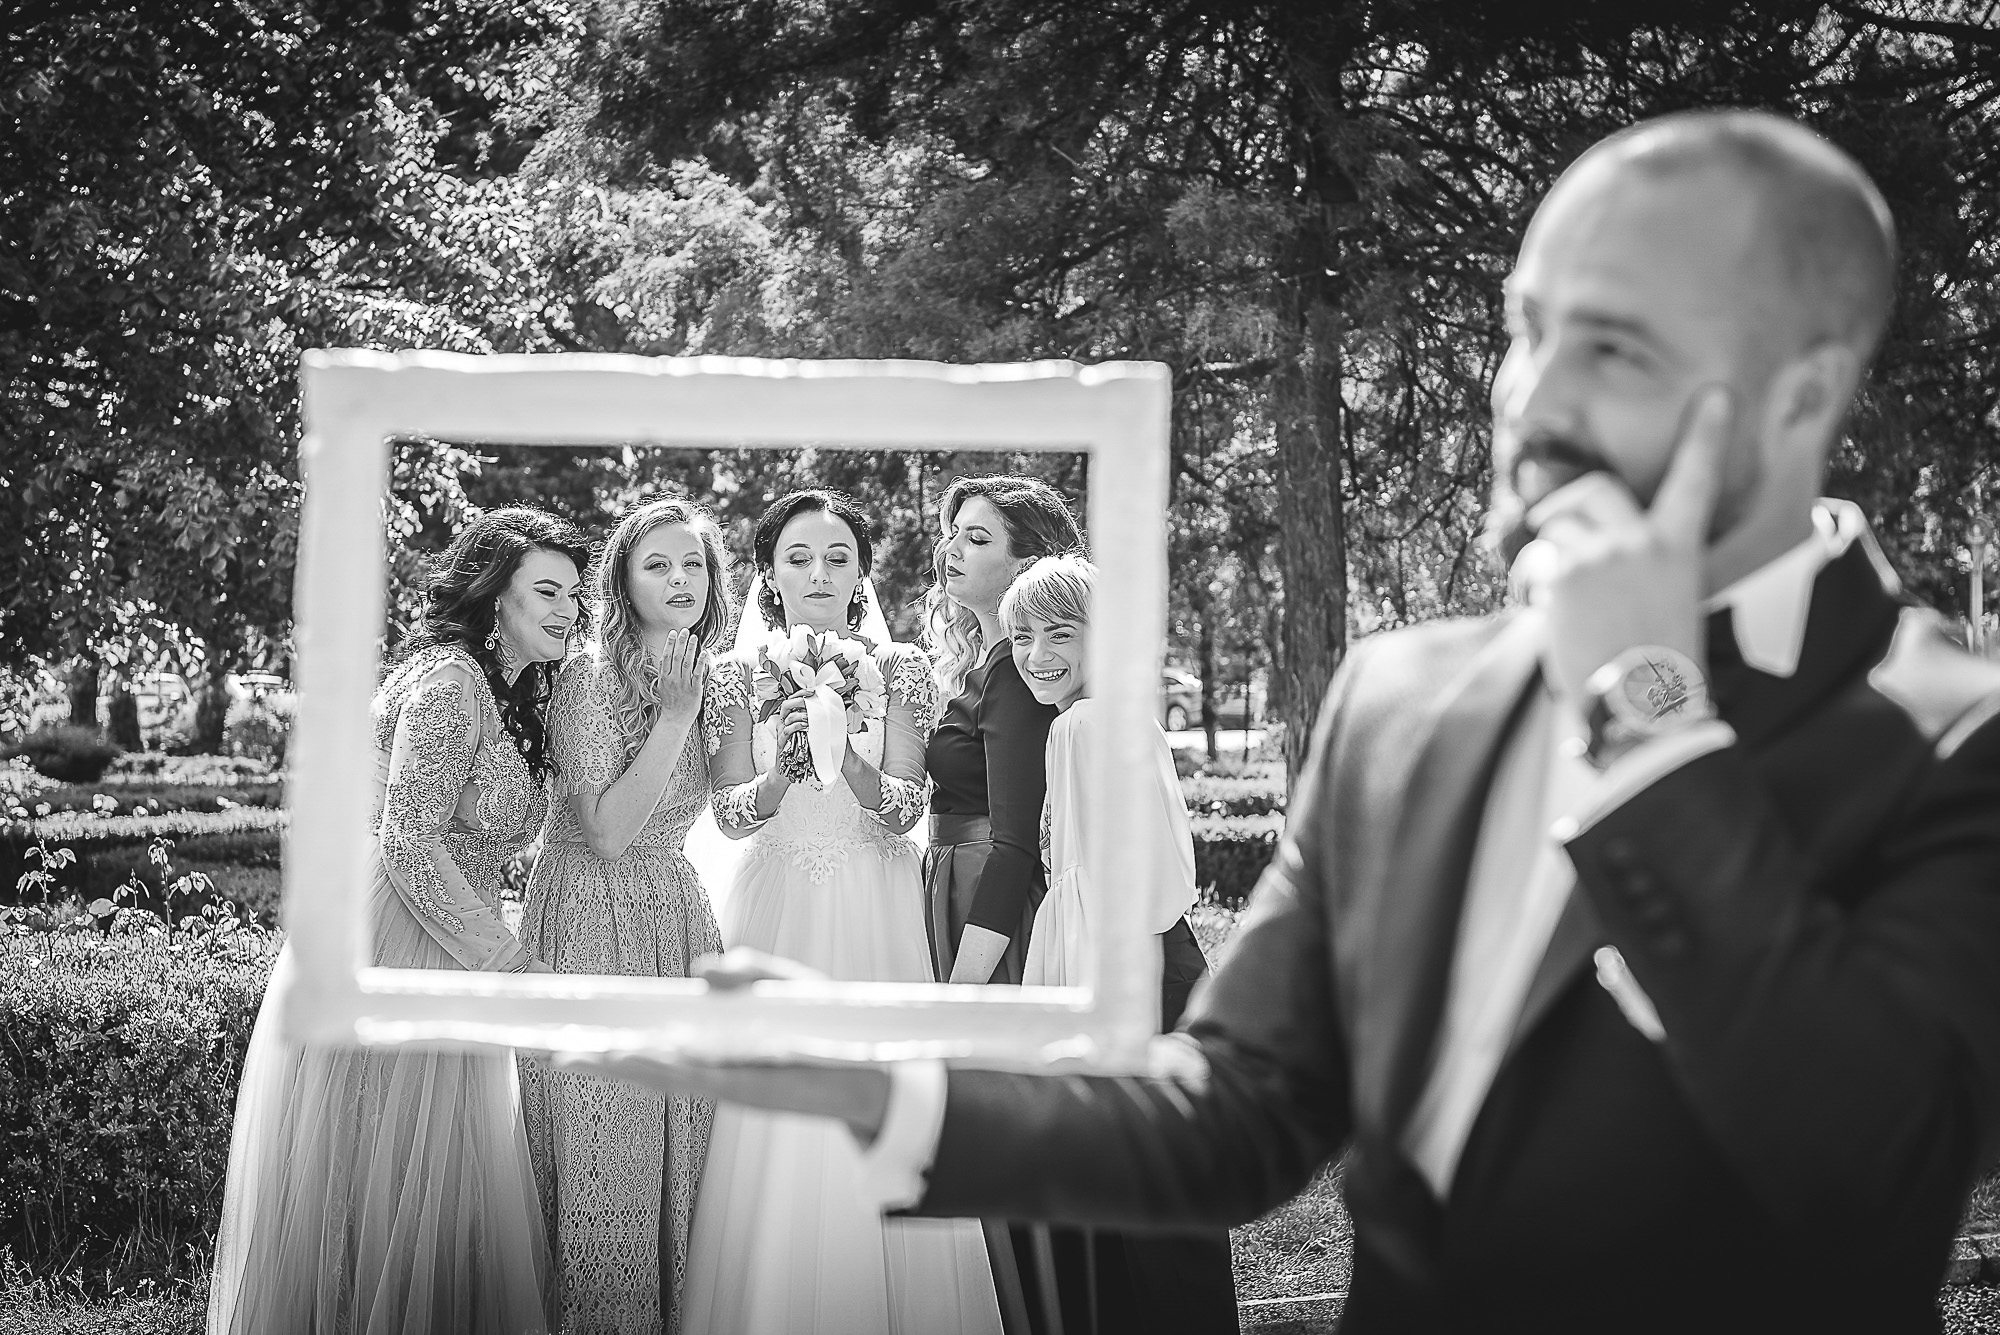 domnisoarle de onoare, distractie in parc, fotosedinta distractiva, fotografie creativa de nunta, fotograf nunta mures, foto nunta reghin, foto video reghin, foto video nunta mures